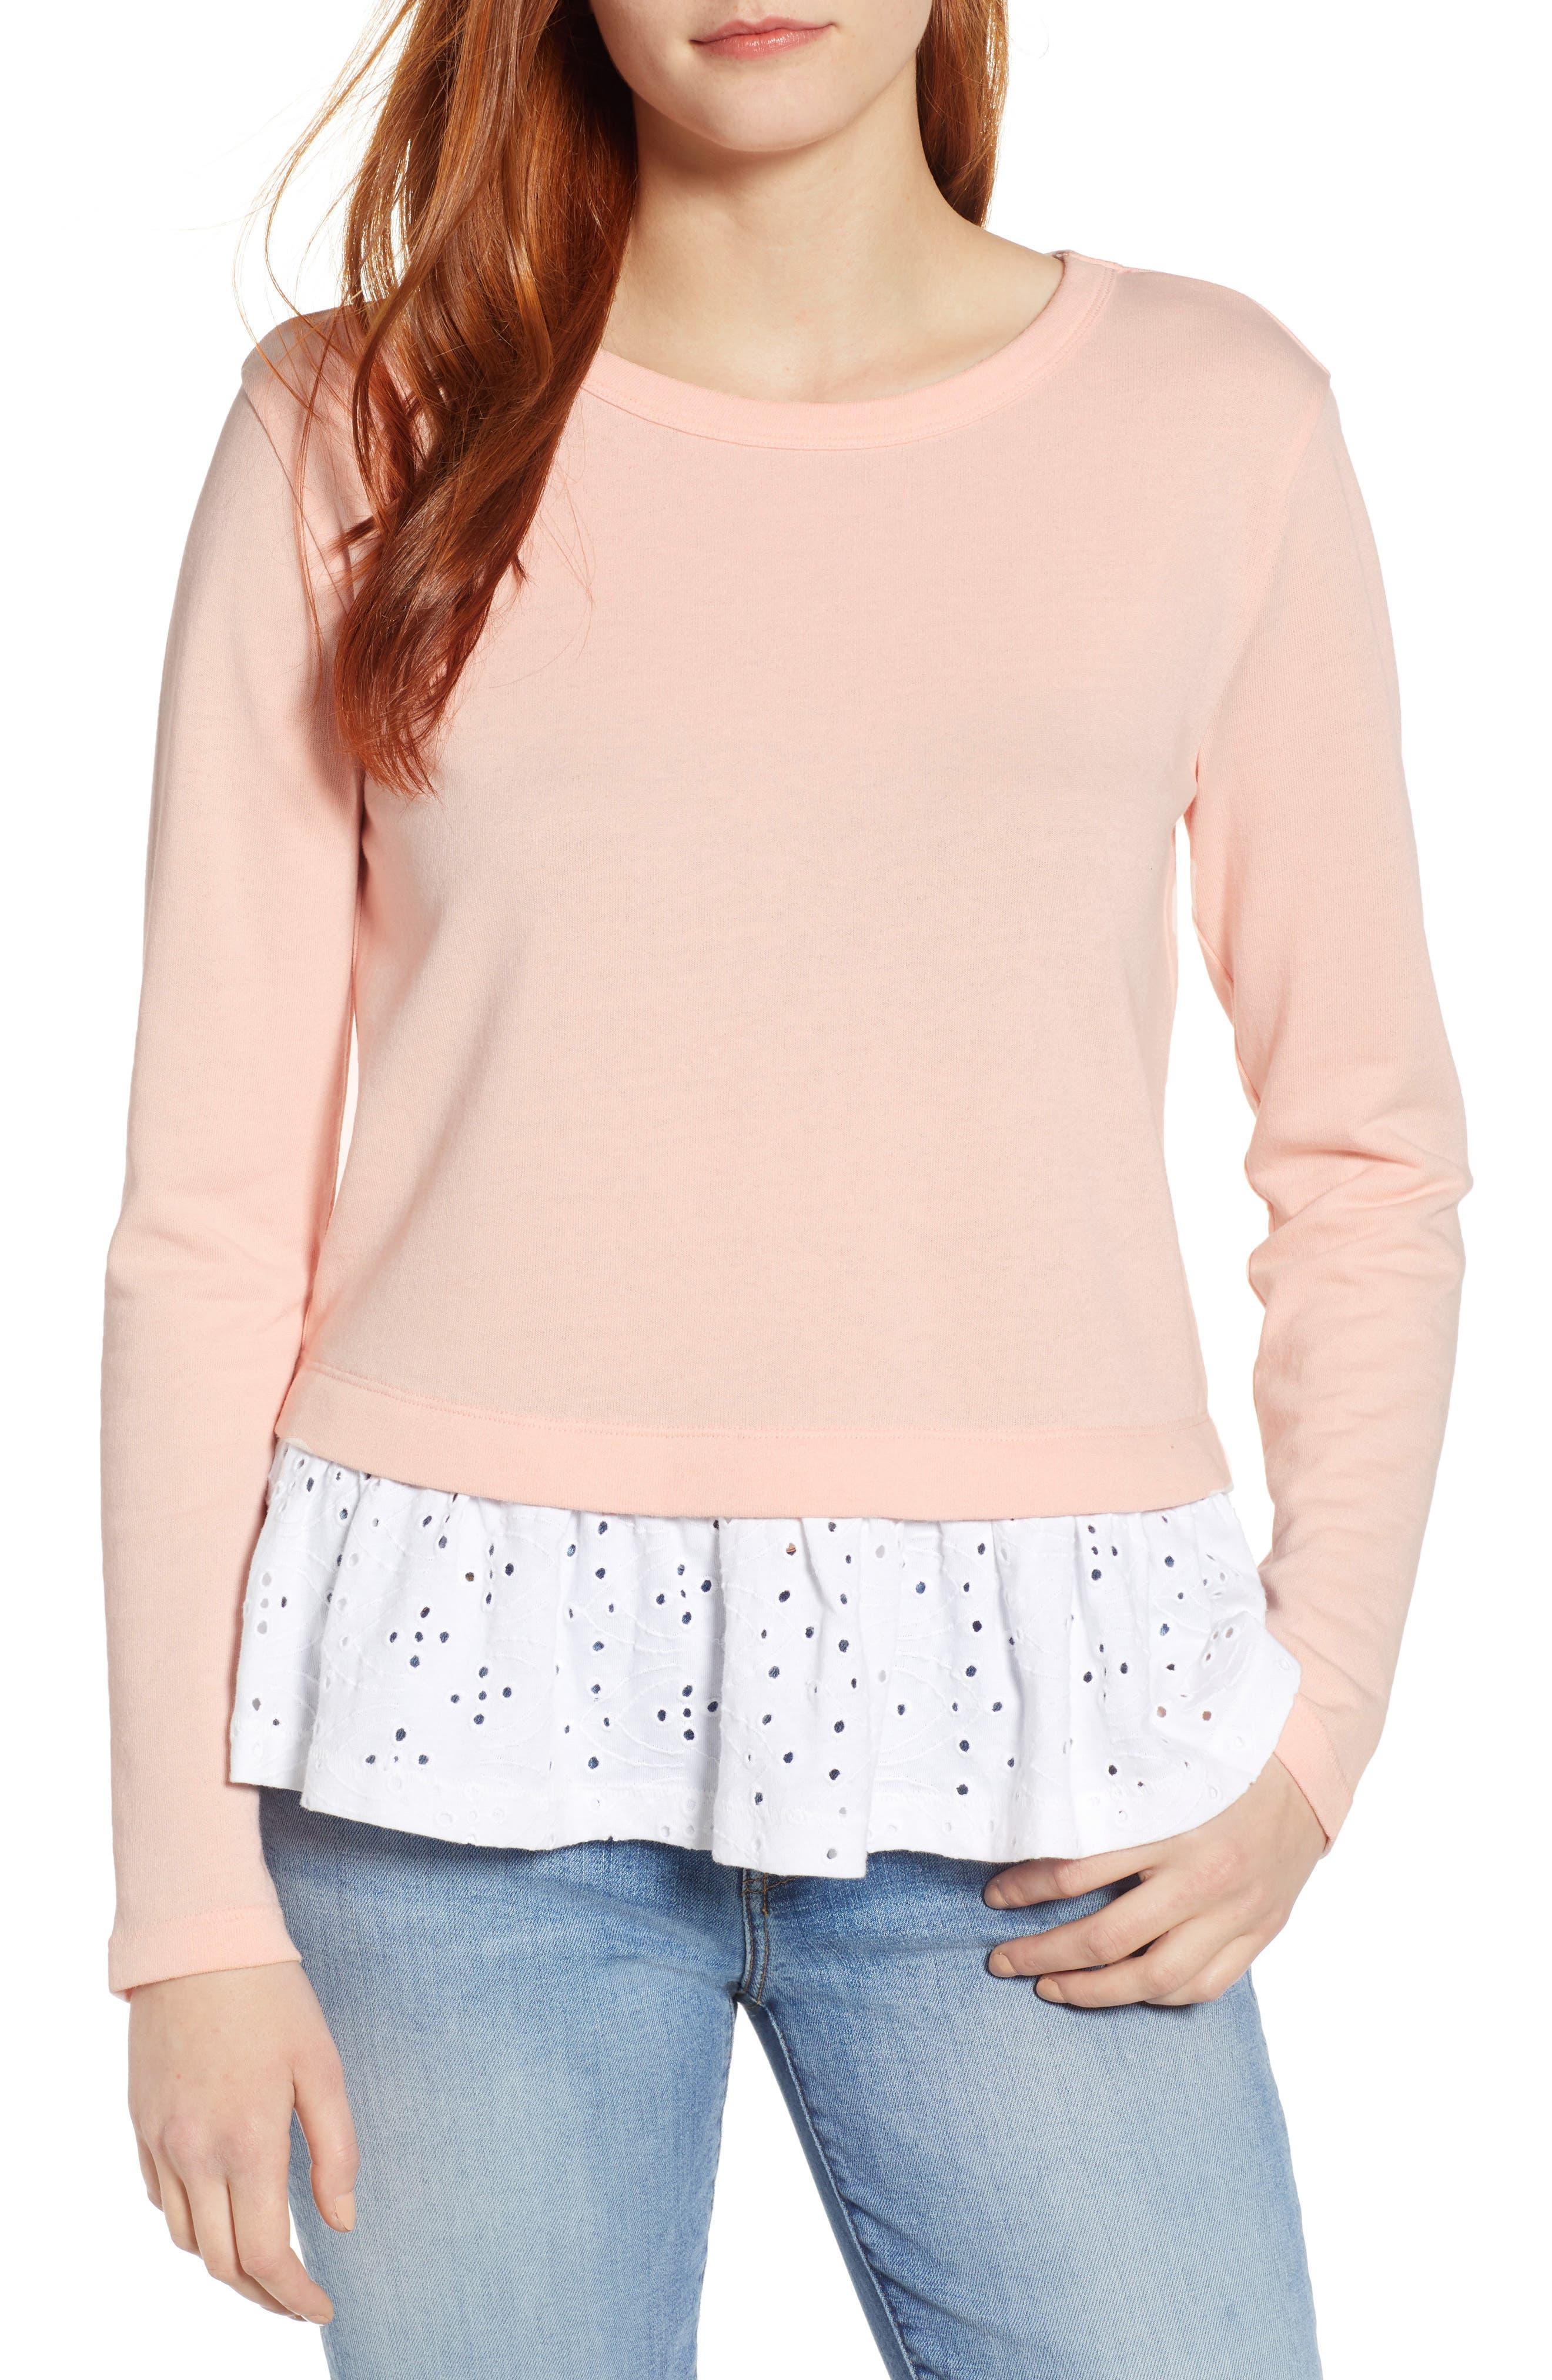 Eyelet Peplum Sweatshirt, Main, color, PINK- WHITE